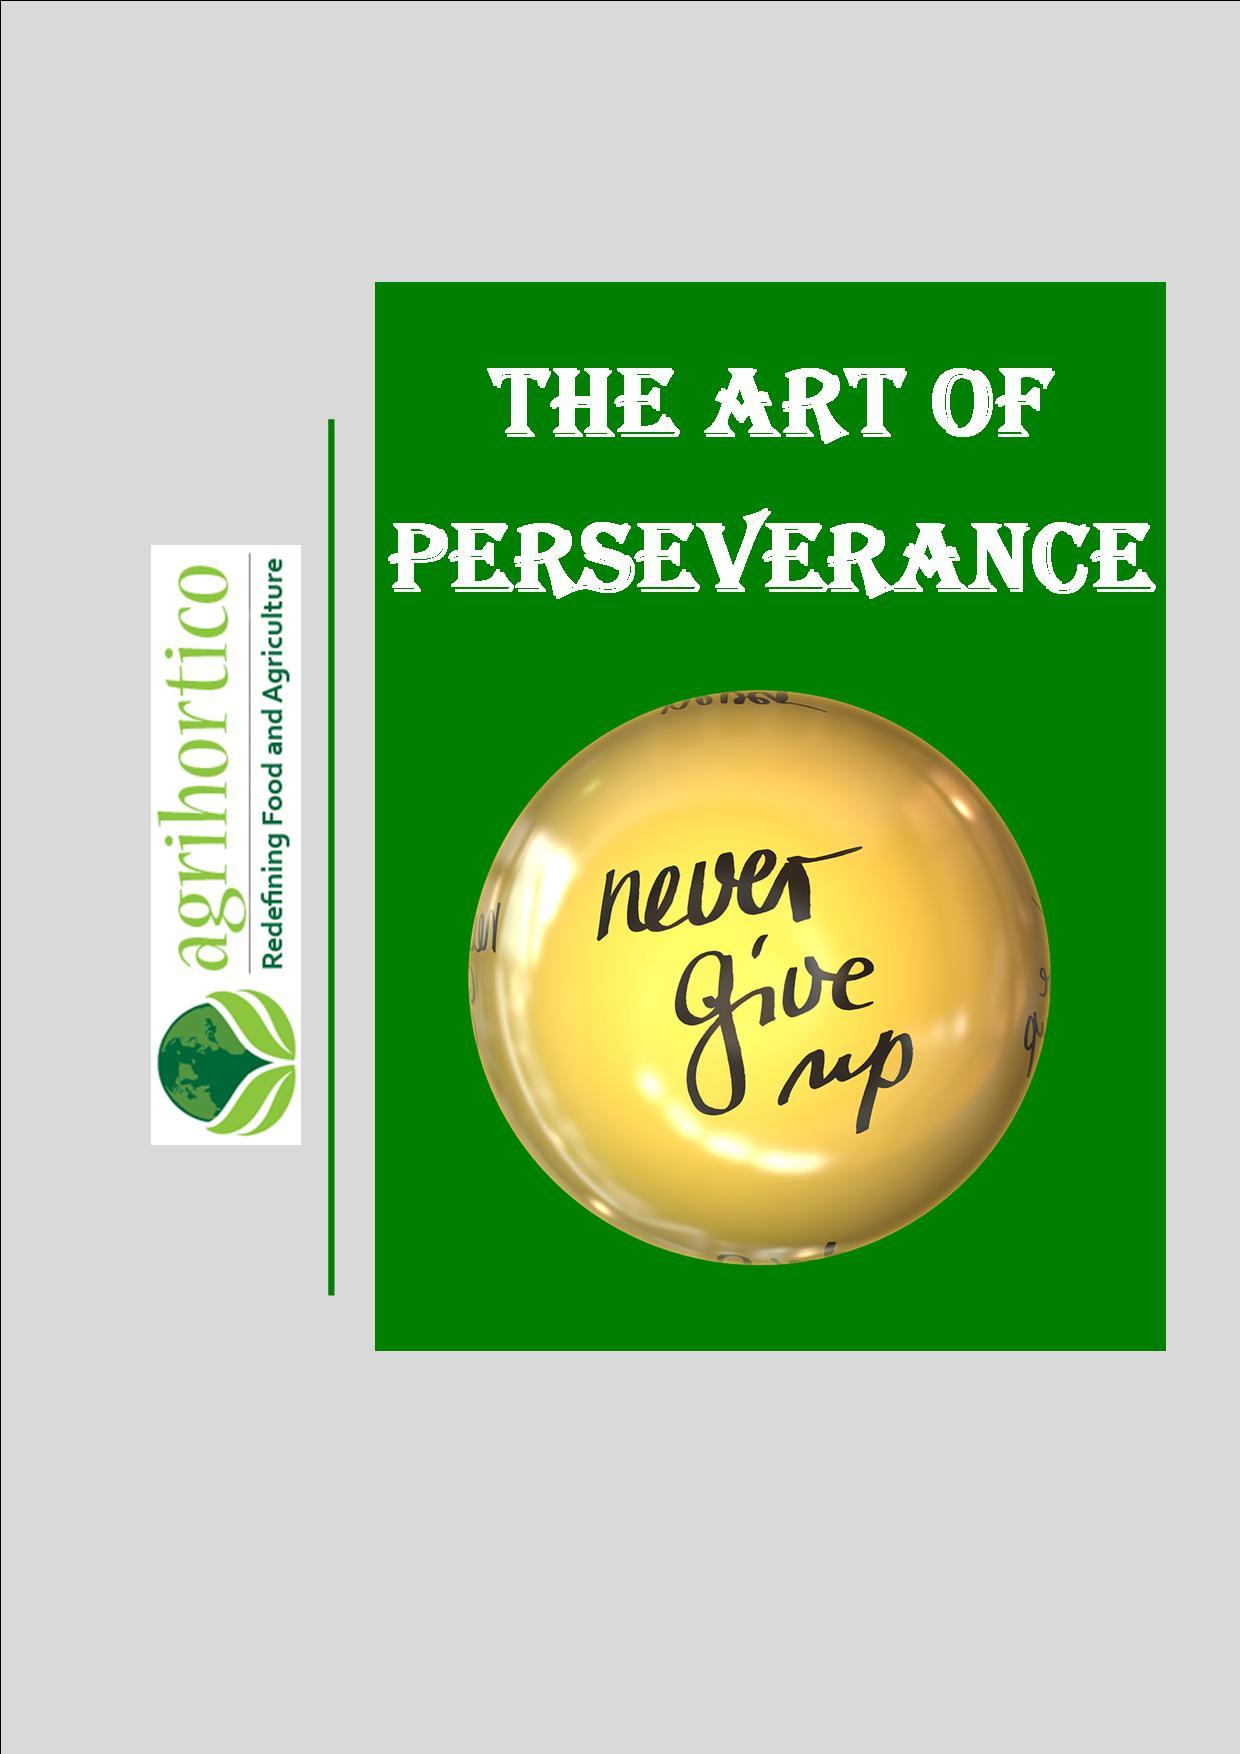 art-of-perseverance